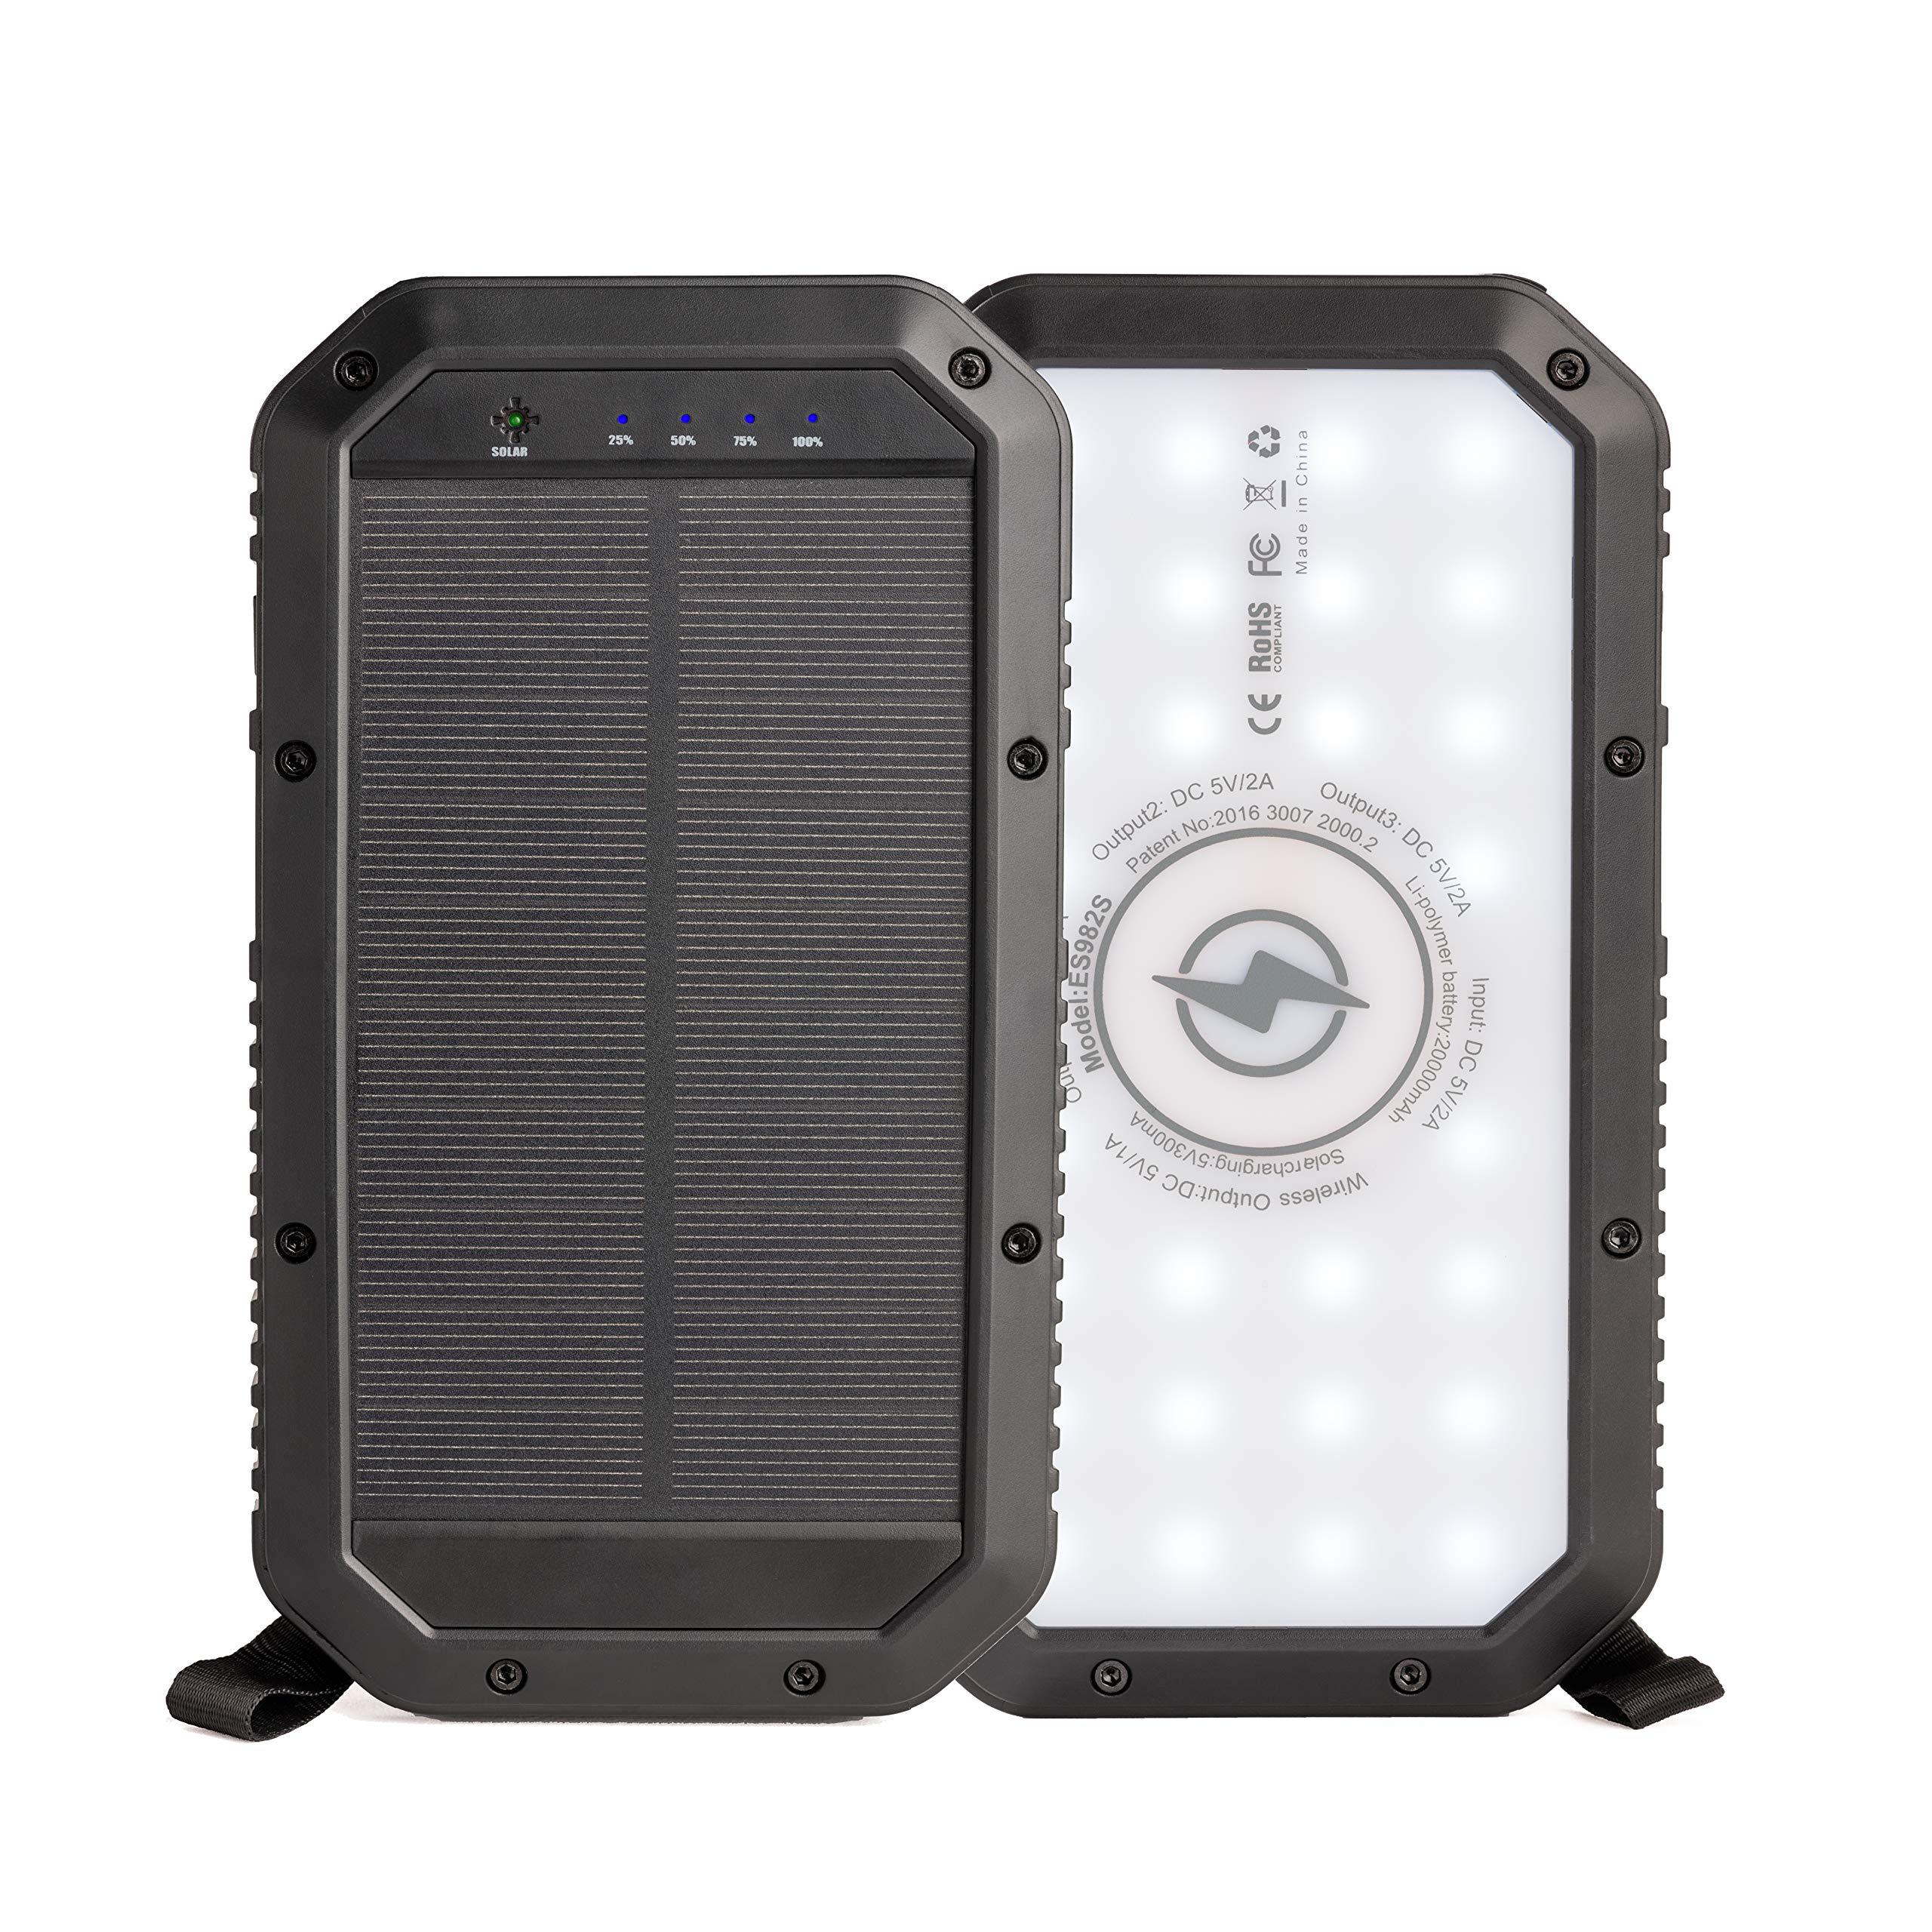 Sozo Solar Charger, Solar Power Bank with Qi Wireless Charging, 20,000mAh High Capacity Solar Power Bank, Three USB Ports, Bright LED Flashlight with Three Settings